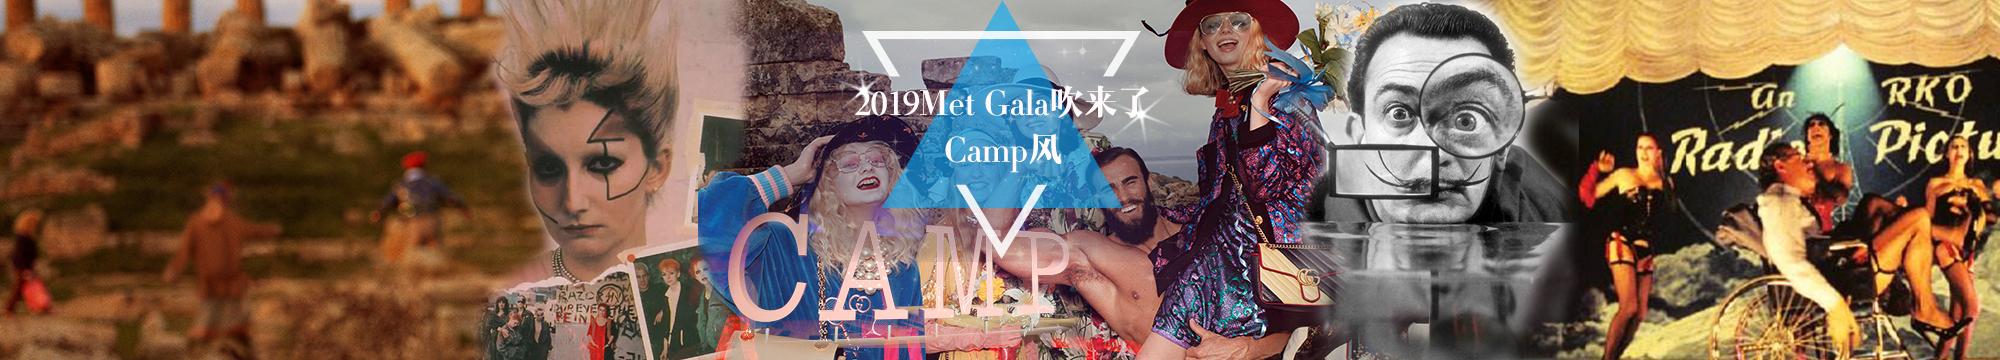 2019 Met Gala吹来的Camp风,没那么简单